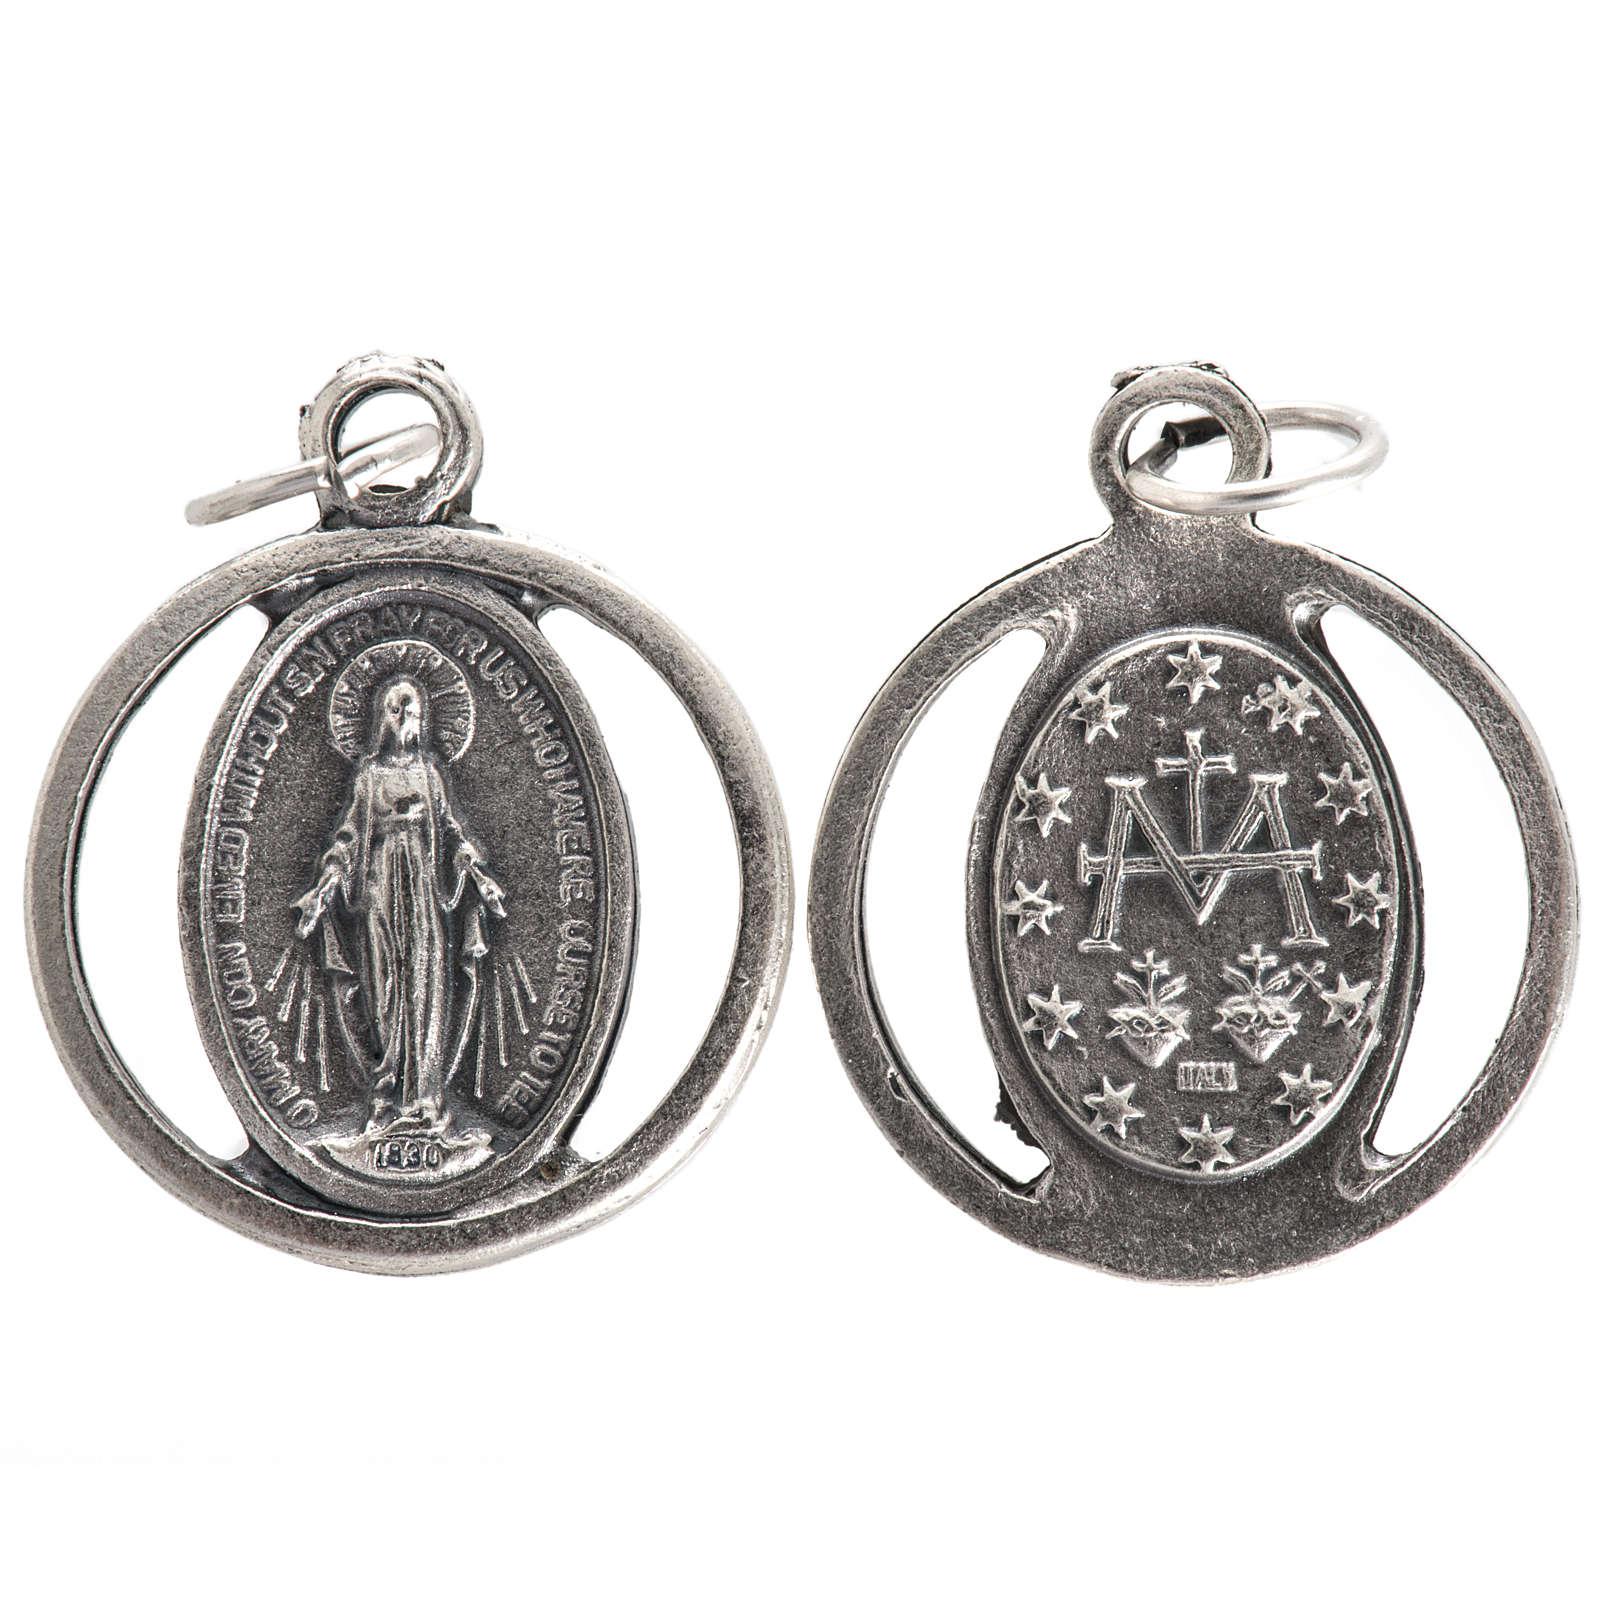 Medalha Nossa Senhora Milagrosa metal oxidado 20 mm 4